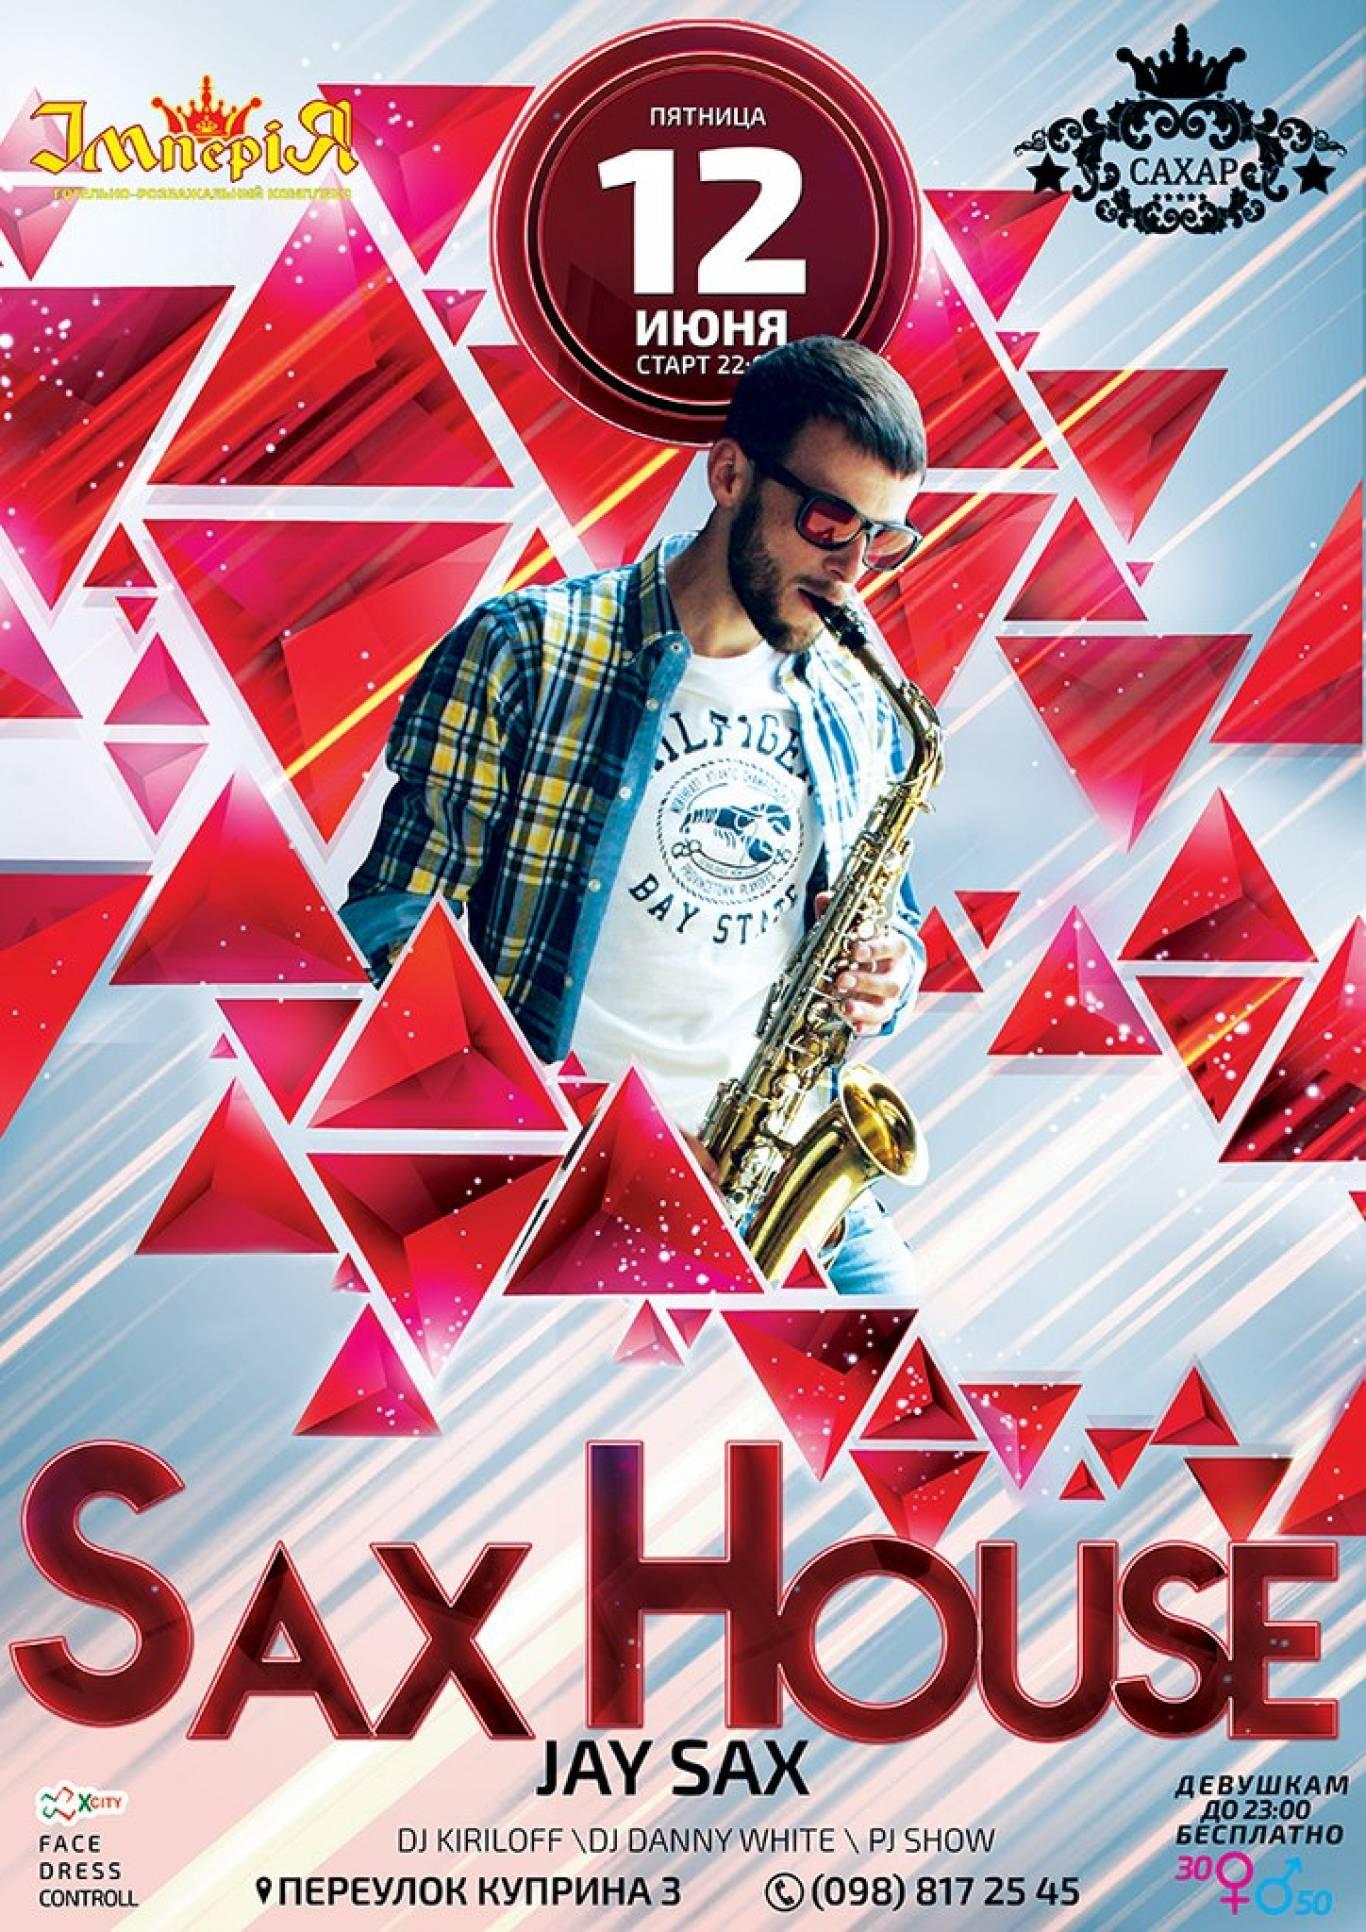 Sax House